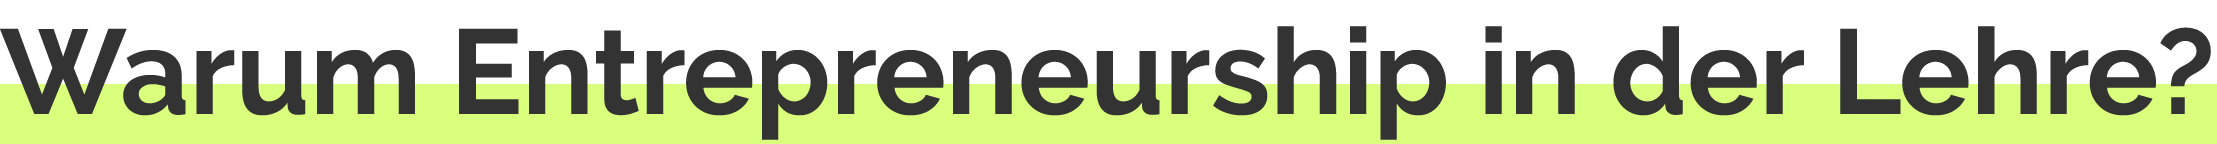 warume